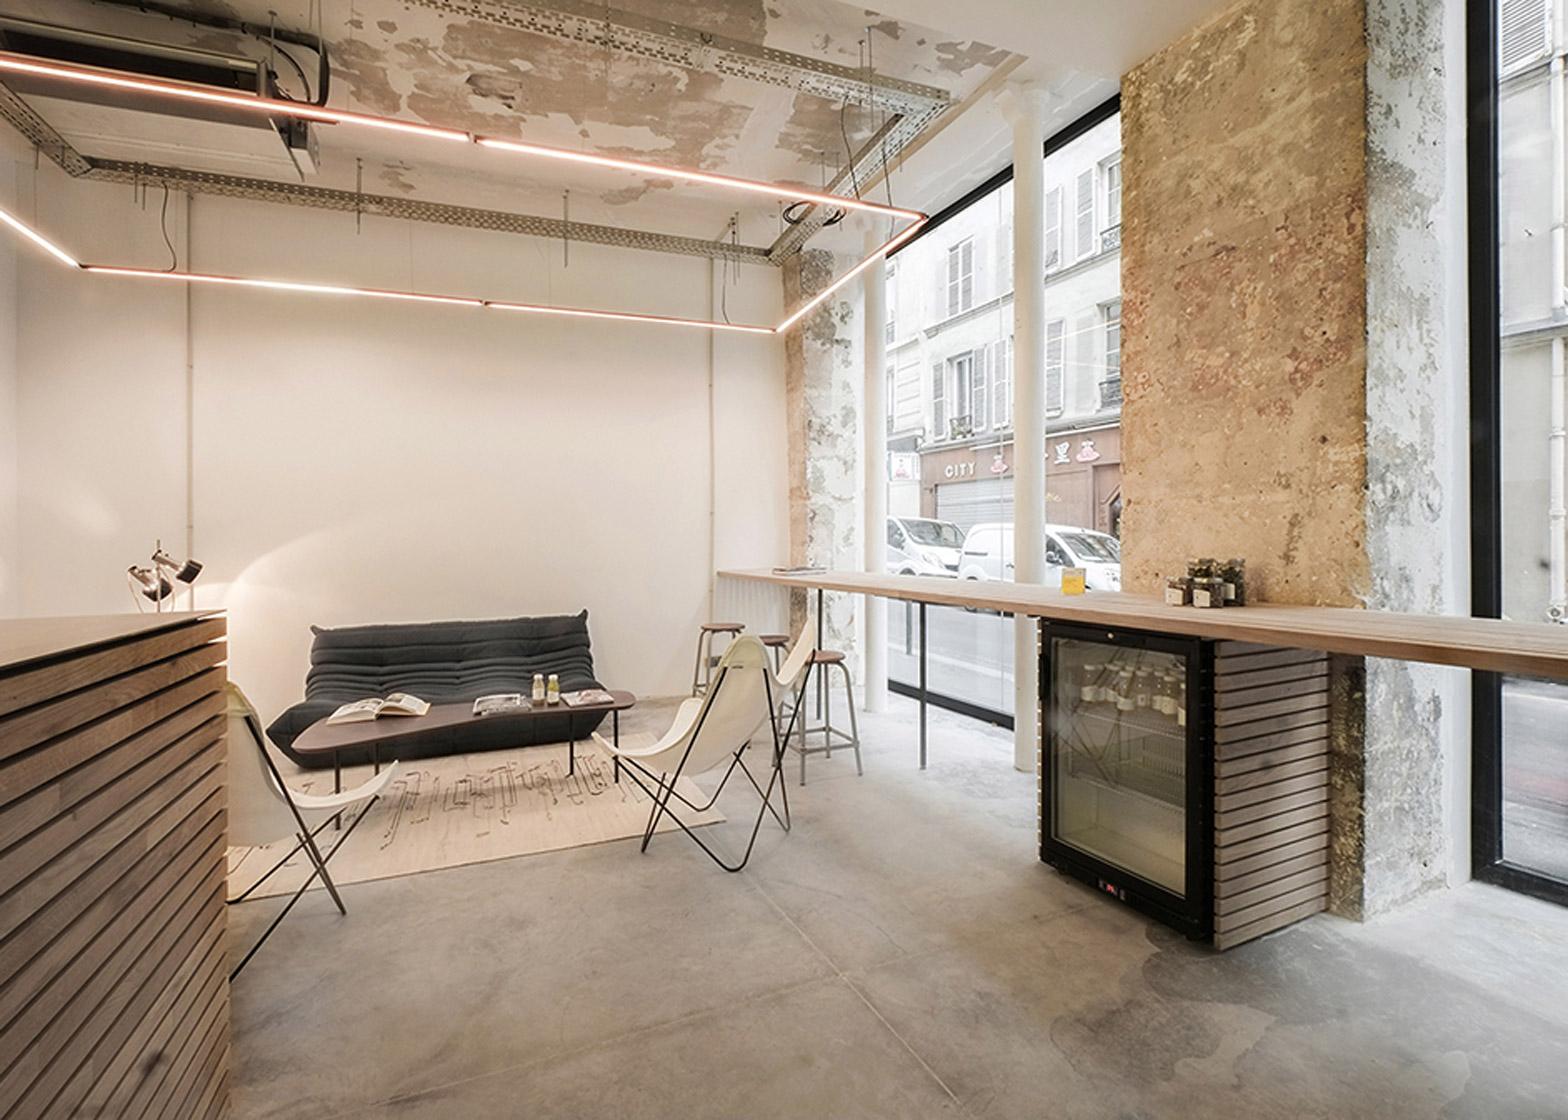 Architecture-paris-sport-club-design-studia-interiors-osnovadesign-osnova-poltava-08